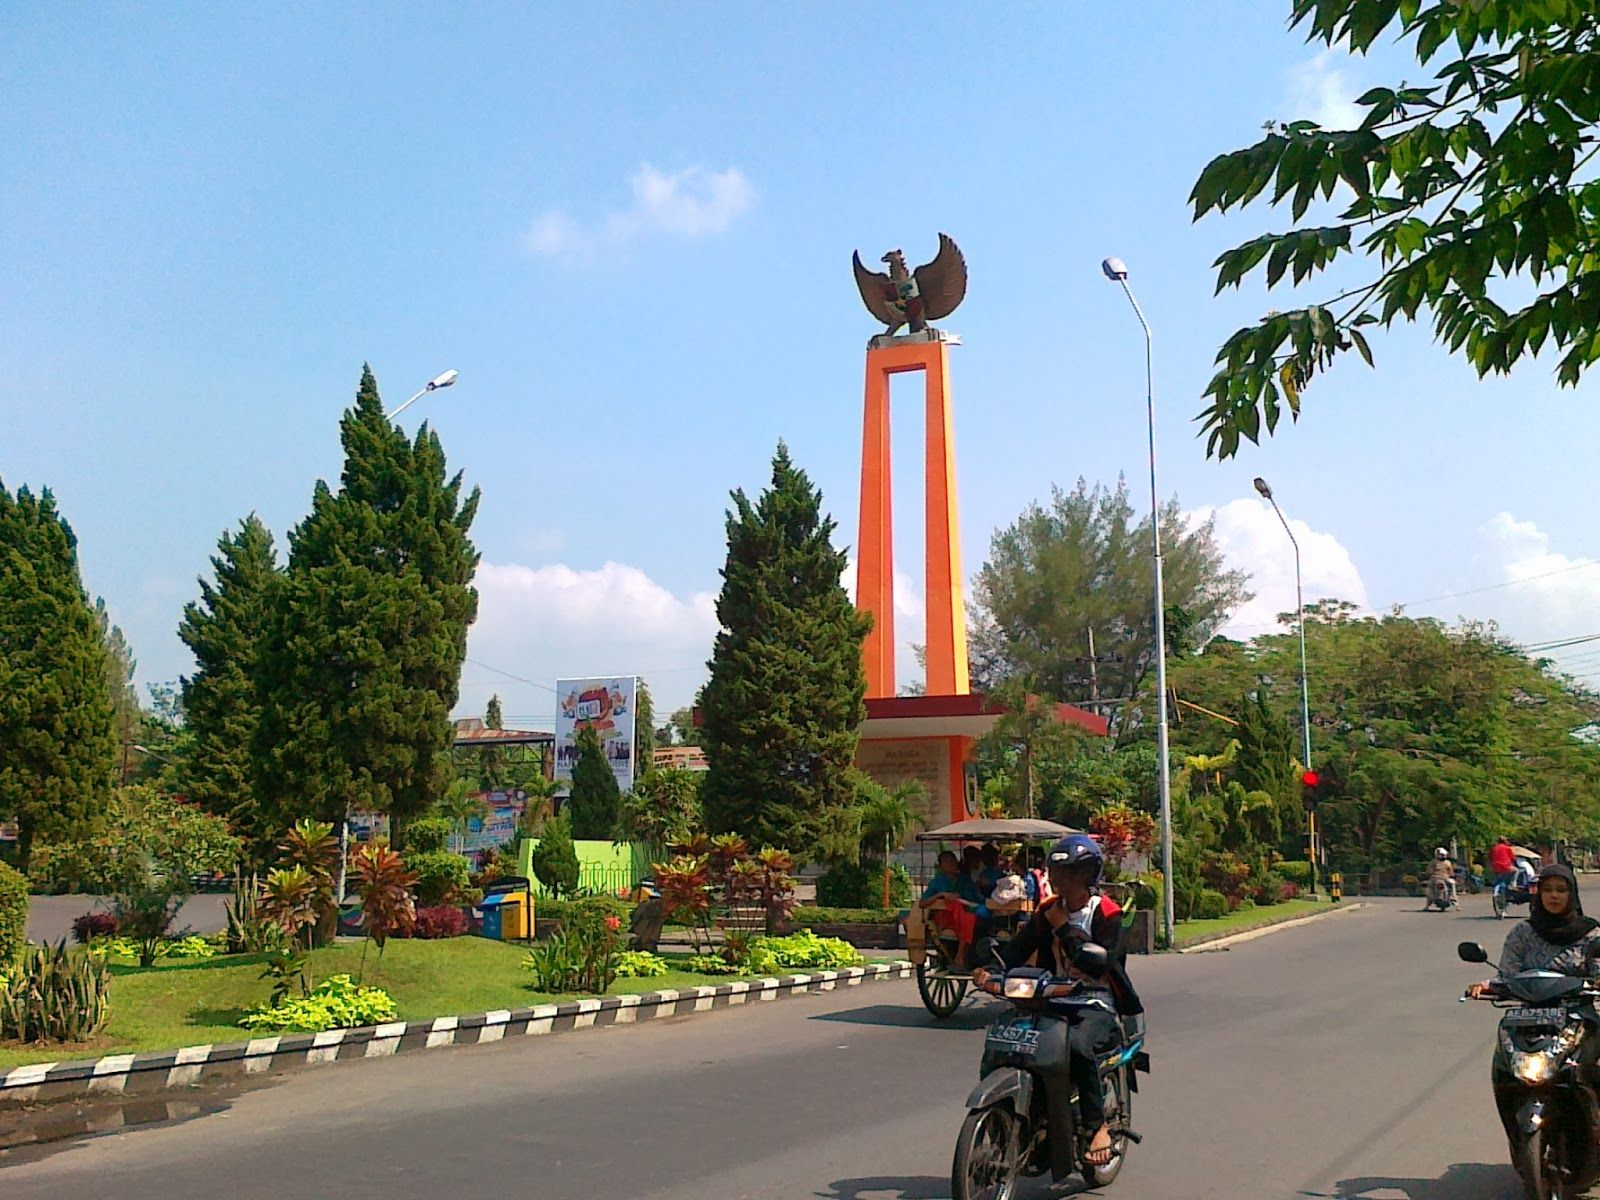 Kampung Inggris Pare is an area in Pare, Kediri that